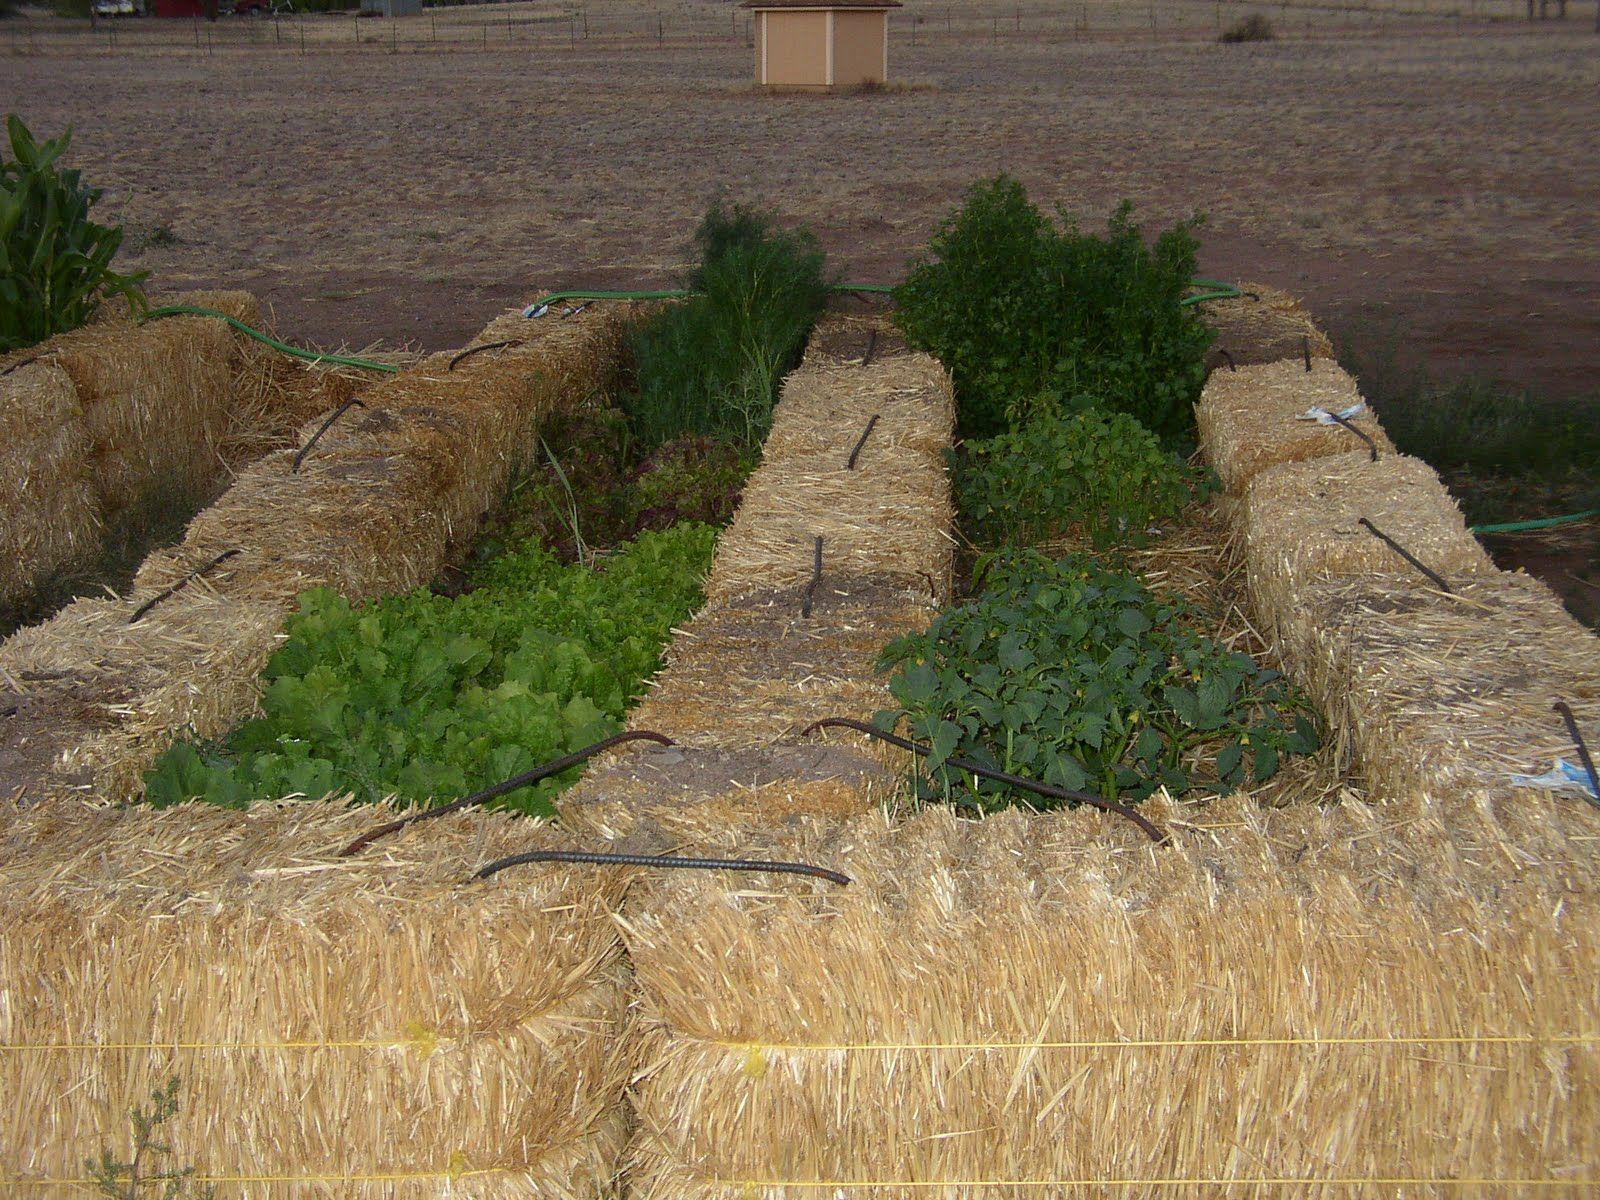 straw bale gardening - Google Search   Kertészet -- Gardening ...